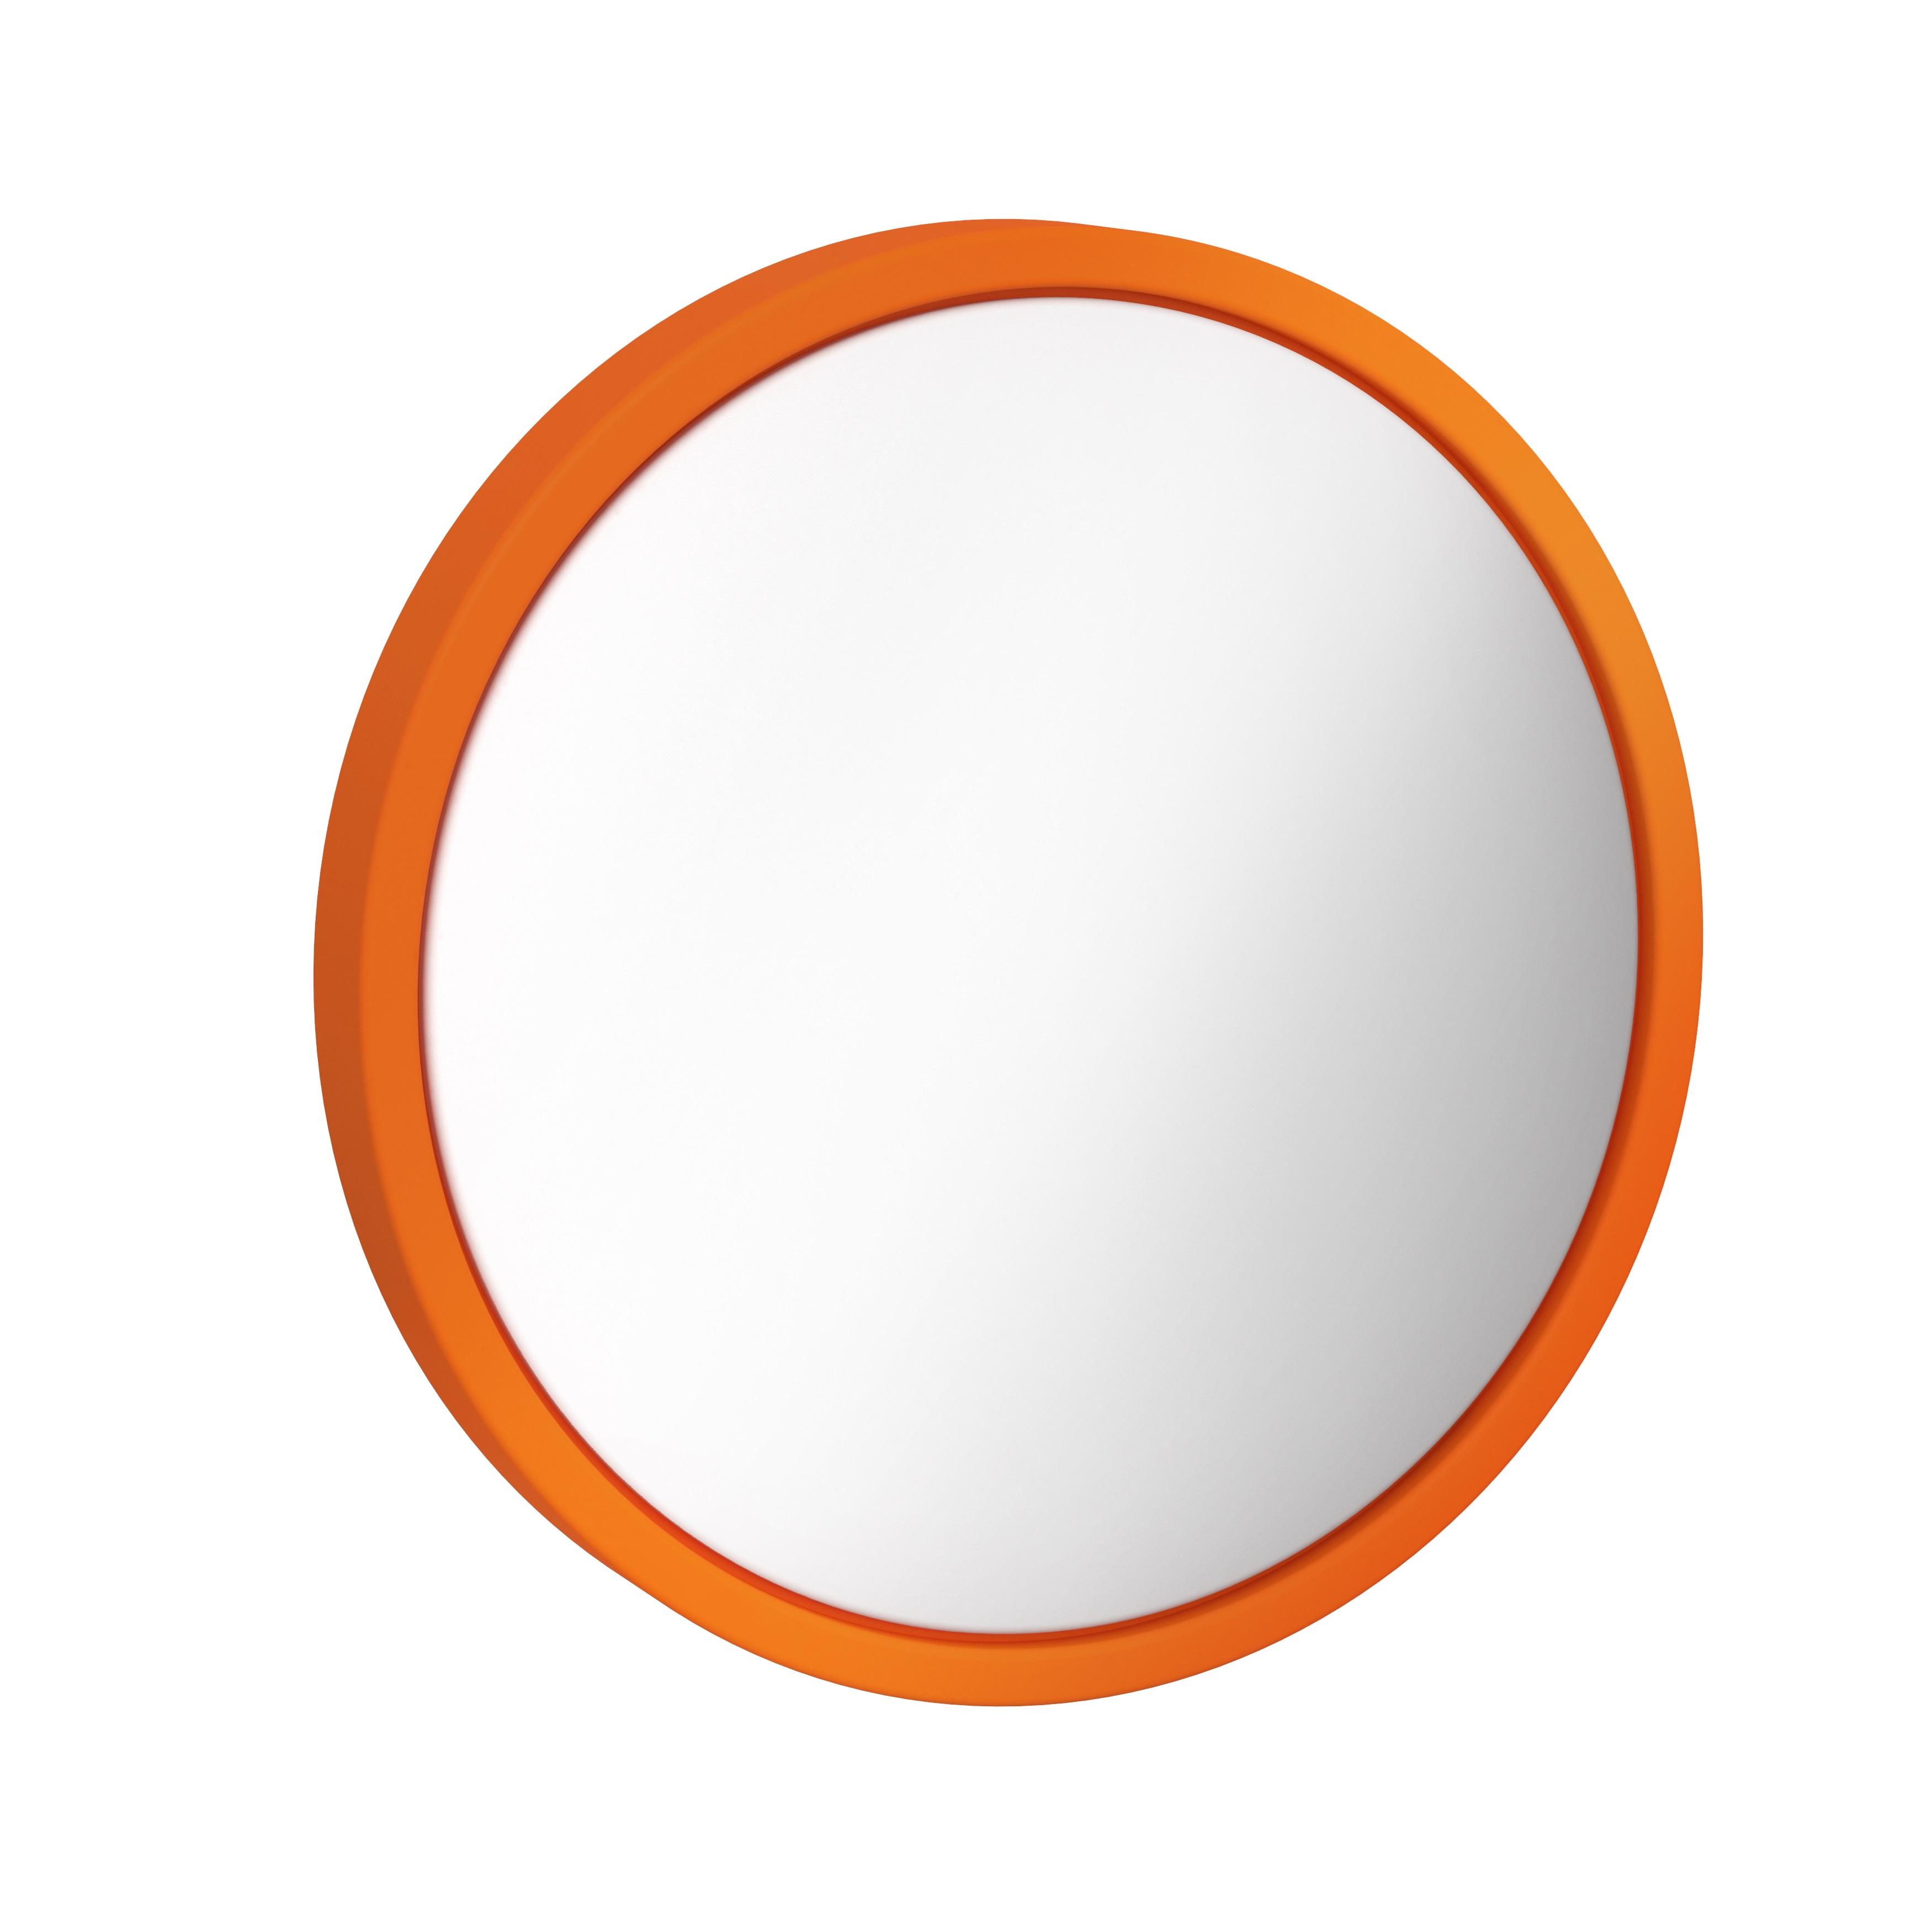 Sento Kids miroir ronde, 20 cm, orange